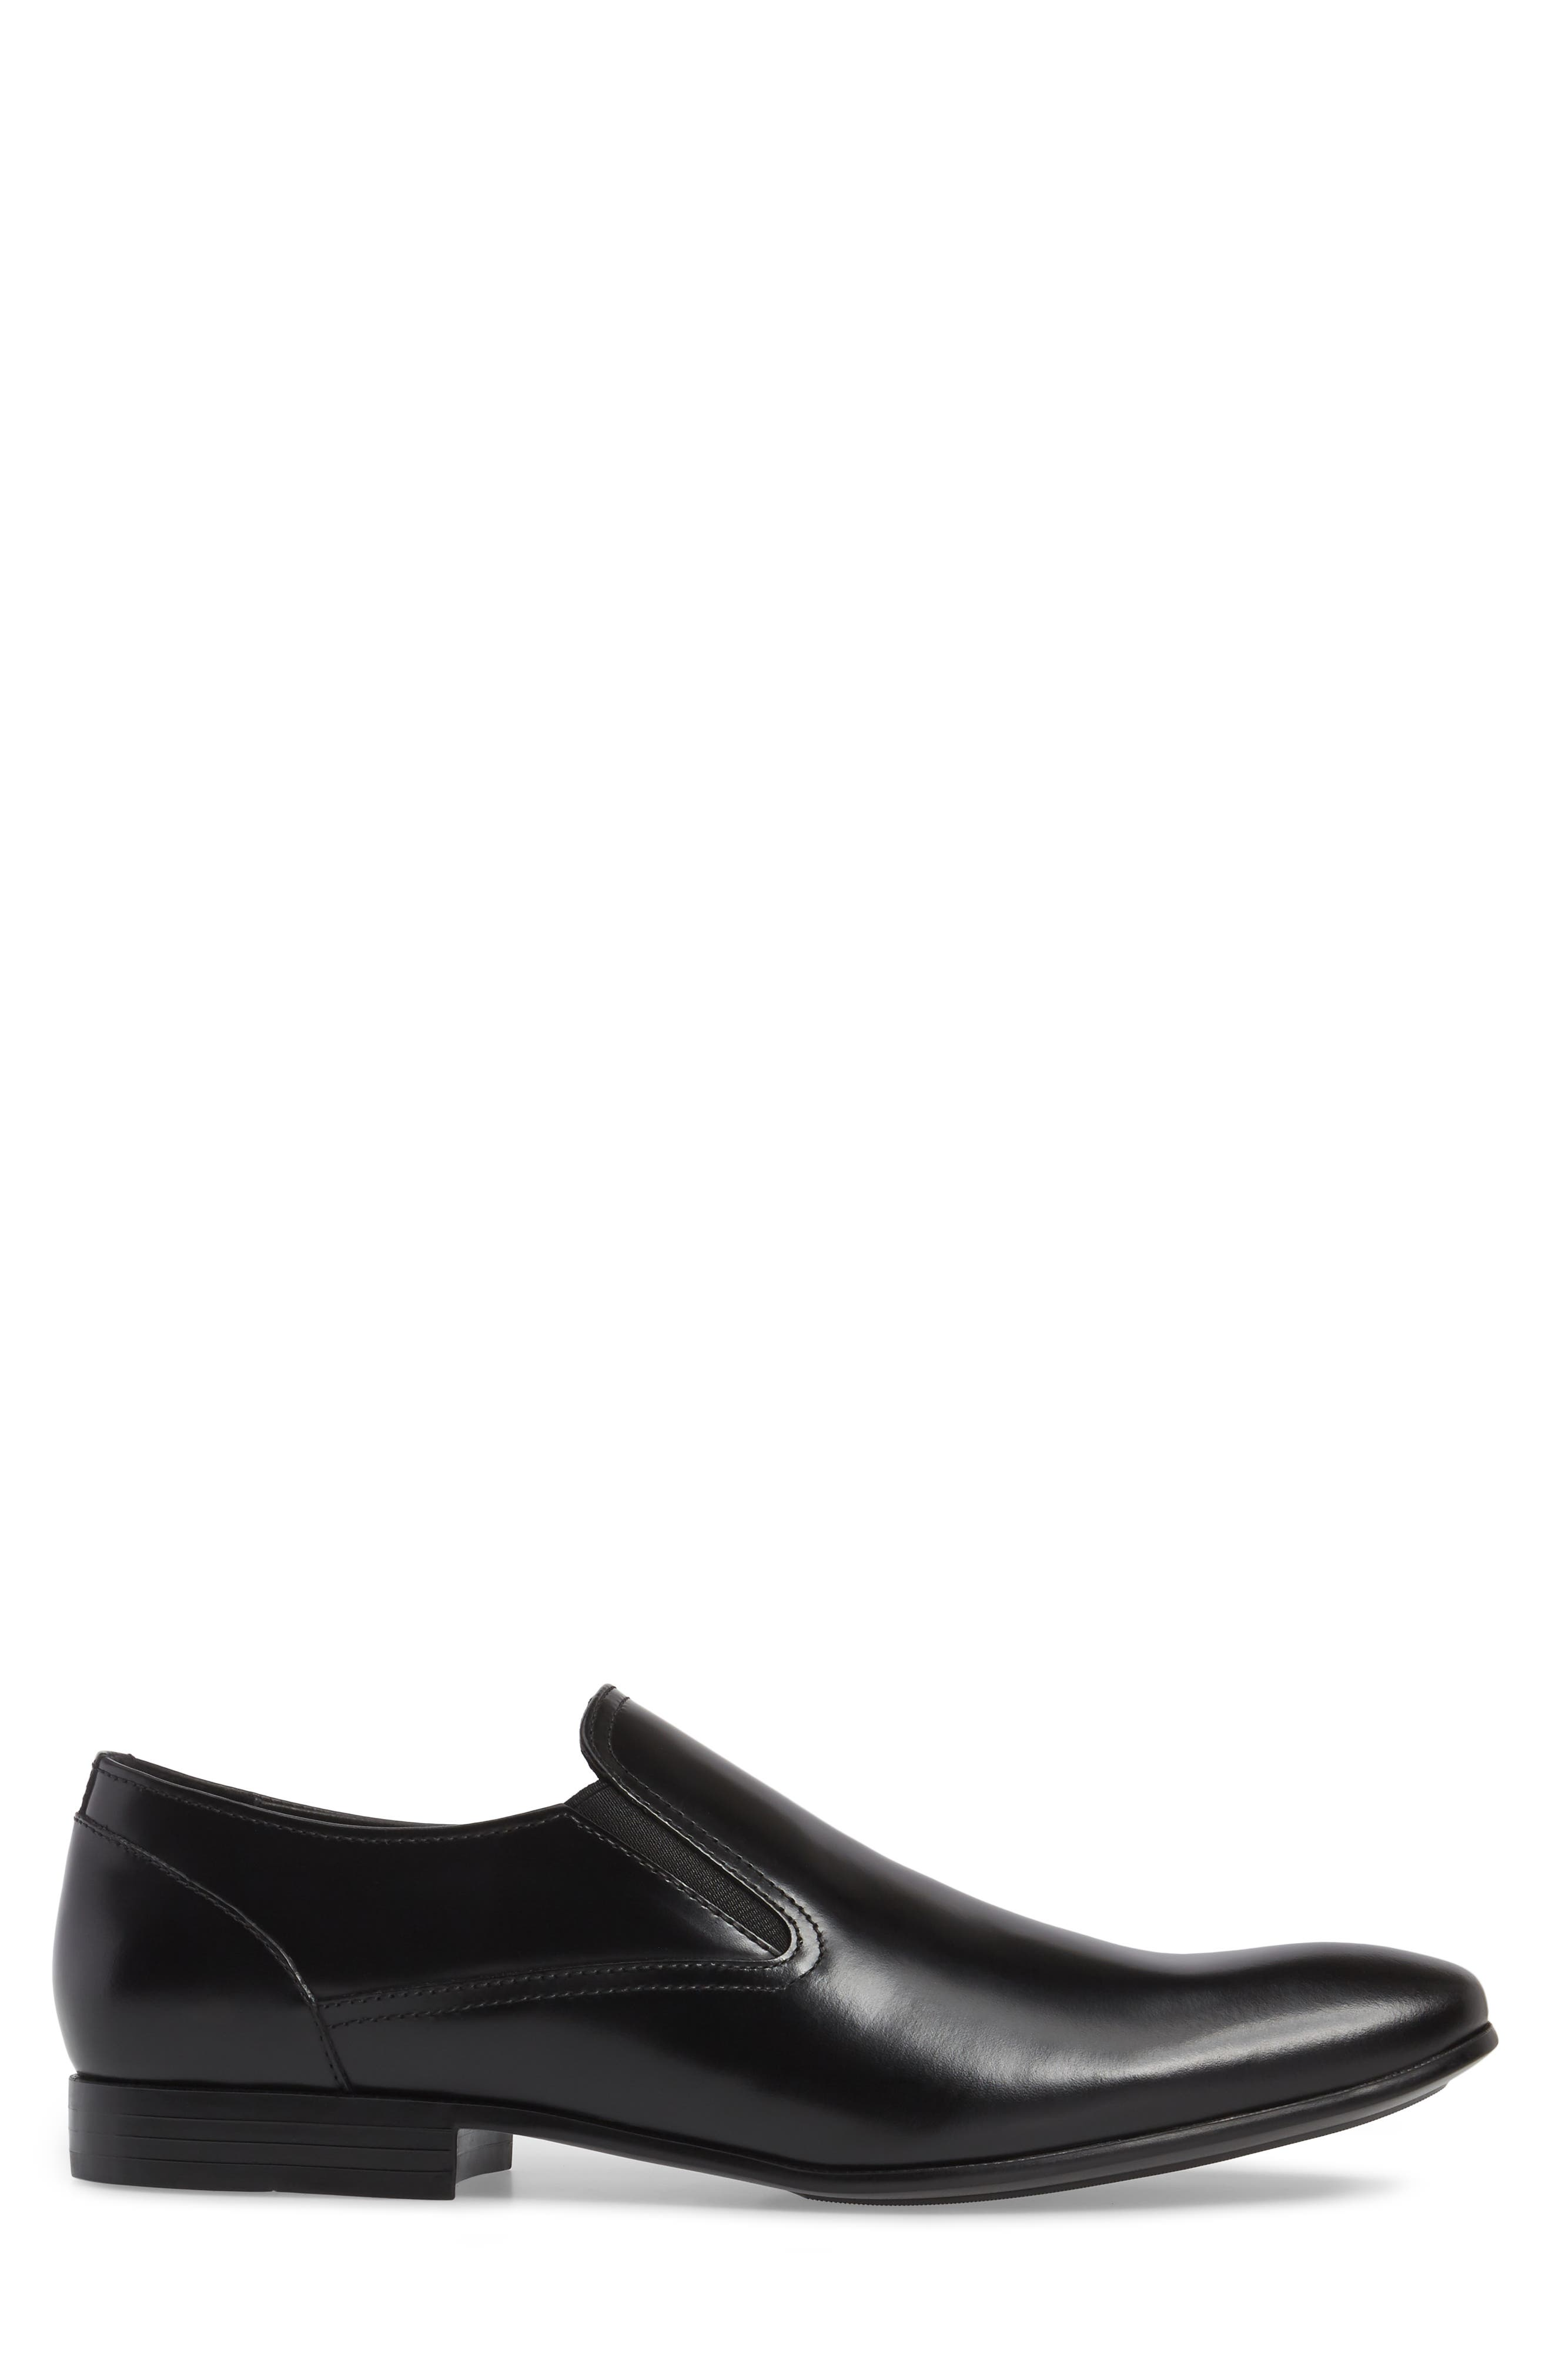 Venetian Loafer,                             Alternate thumbnail 3, color,                             Black Leather